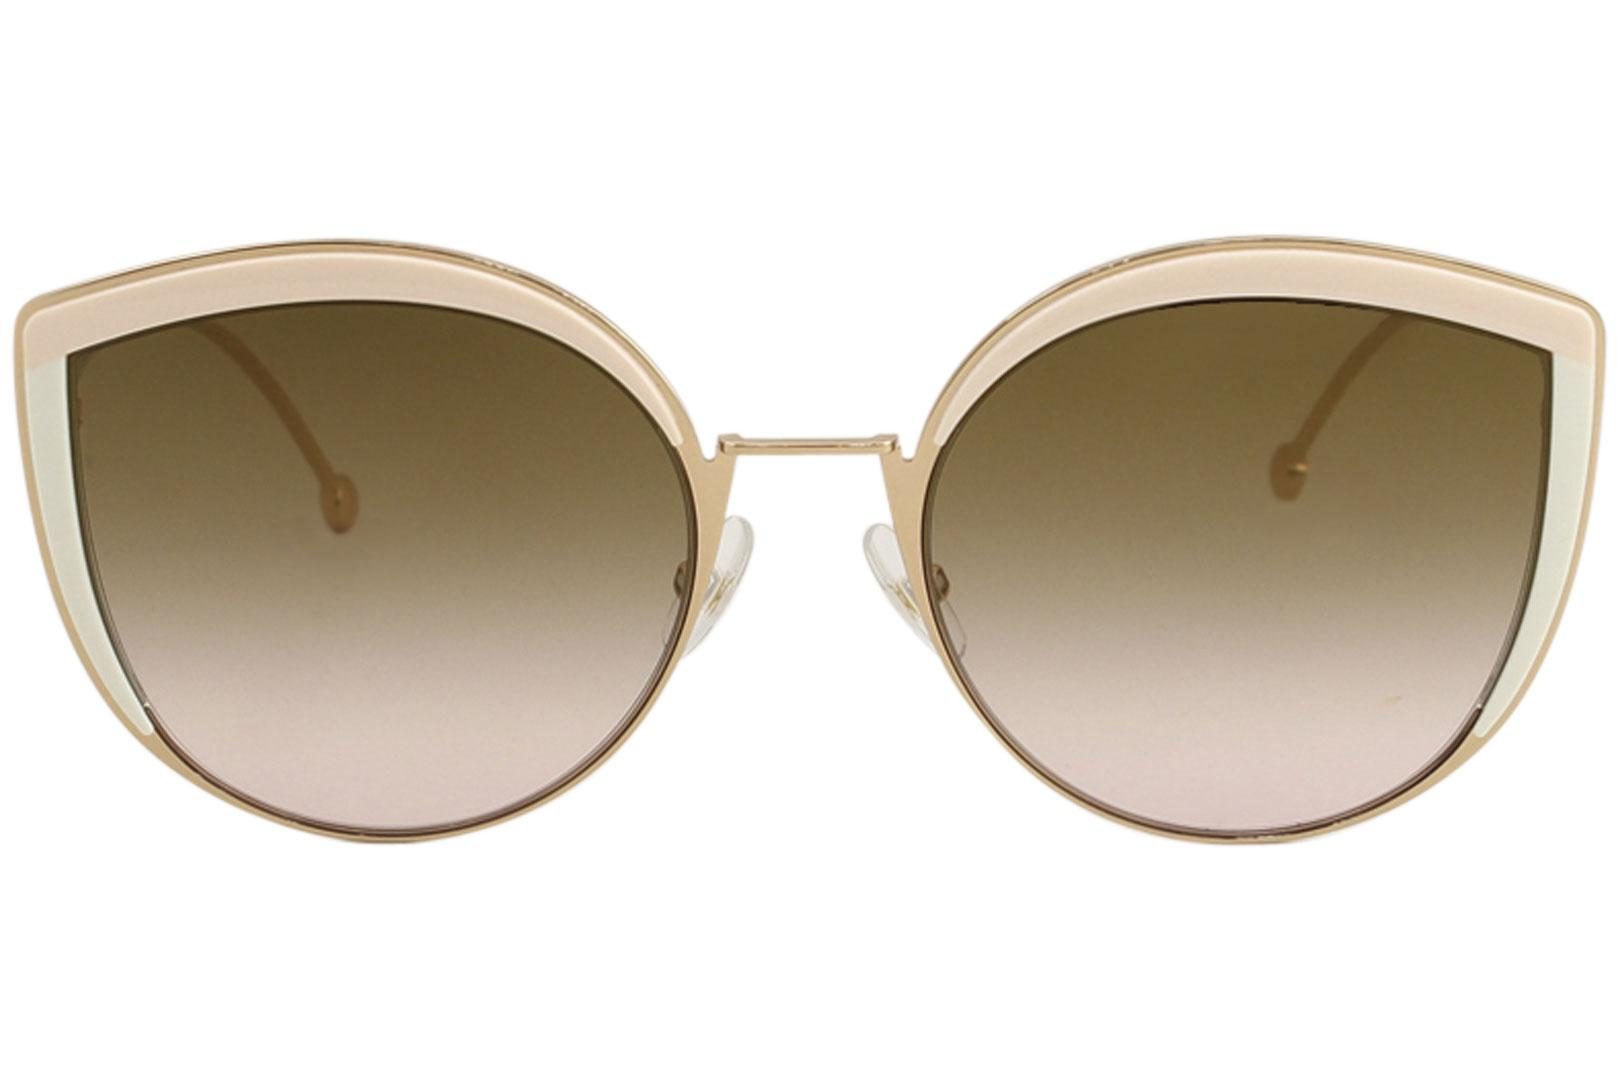 3c104eef5a2 Fendi Women s FF0290 S FF 0290 S Fashion Cat Eye Sunglasses by Fendi